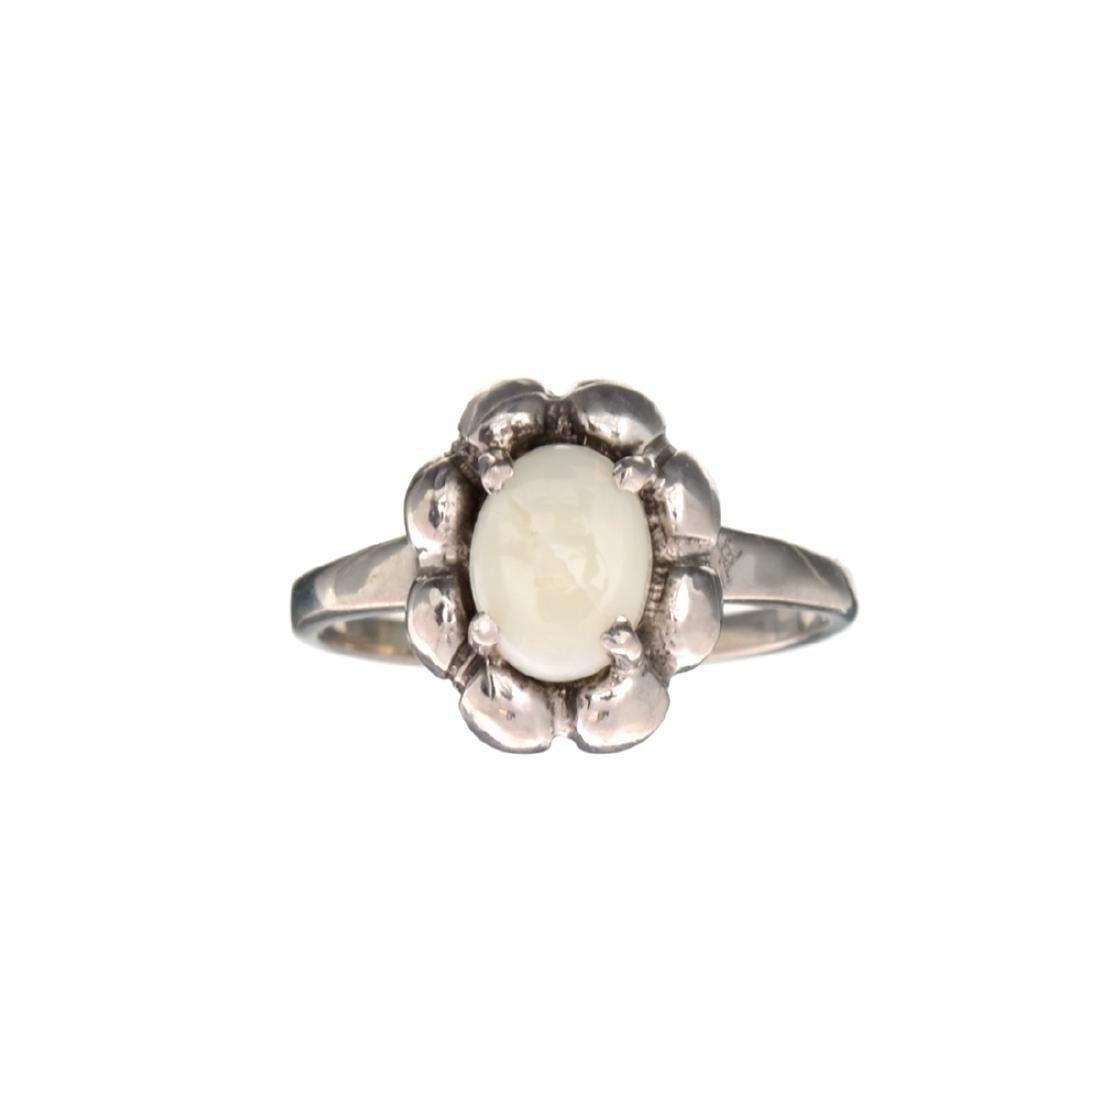 APP: 0.5k Fine Jewelry Designer Sebastian 0.73CT Oval